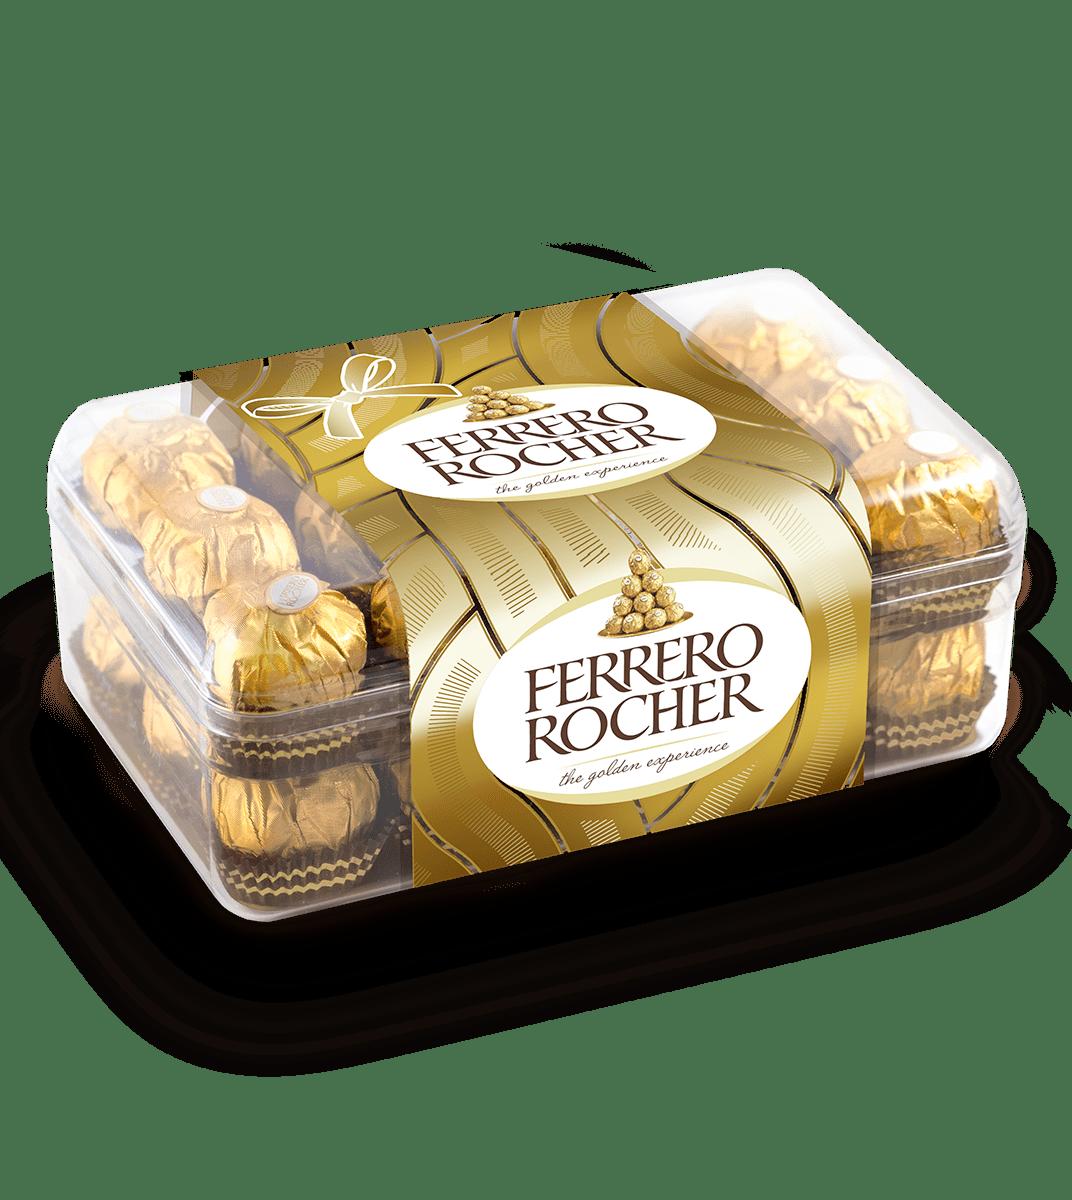 Travel Market - Ferrero Rocher 375g